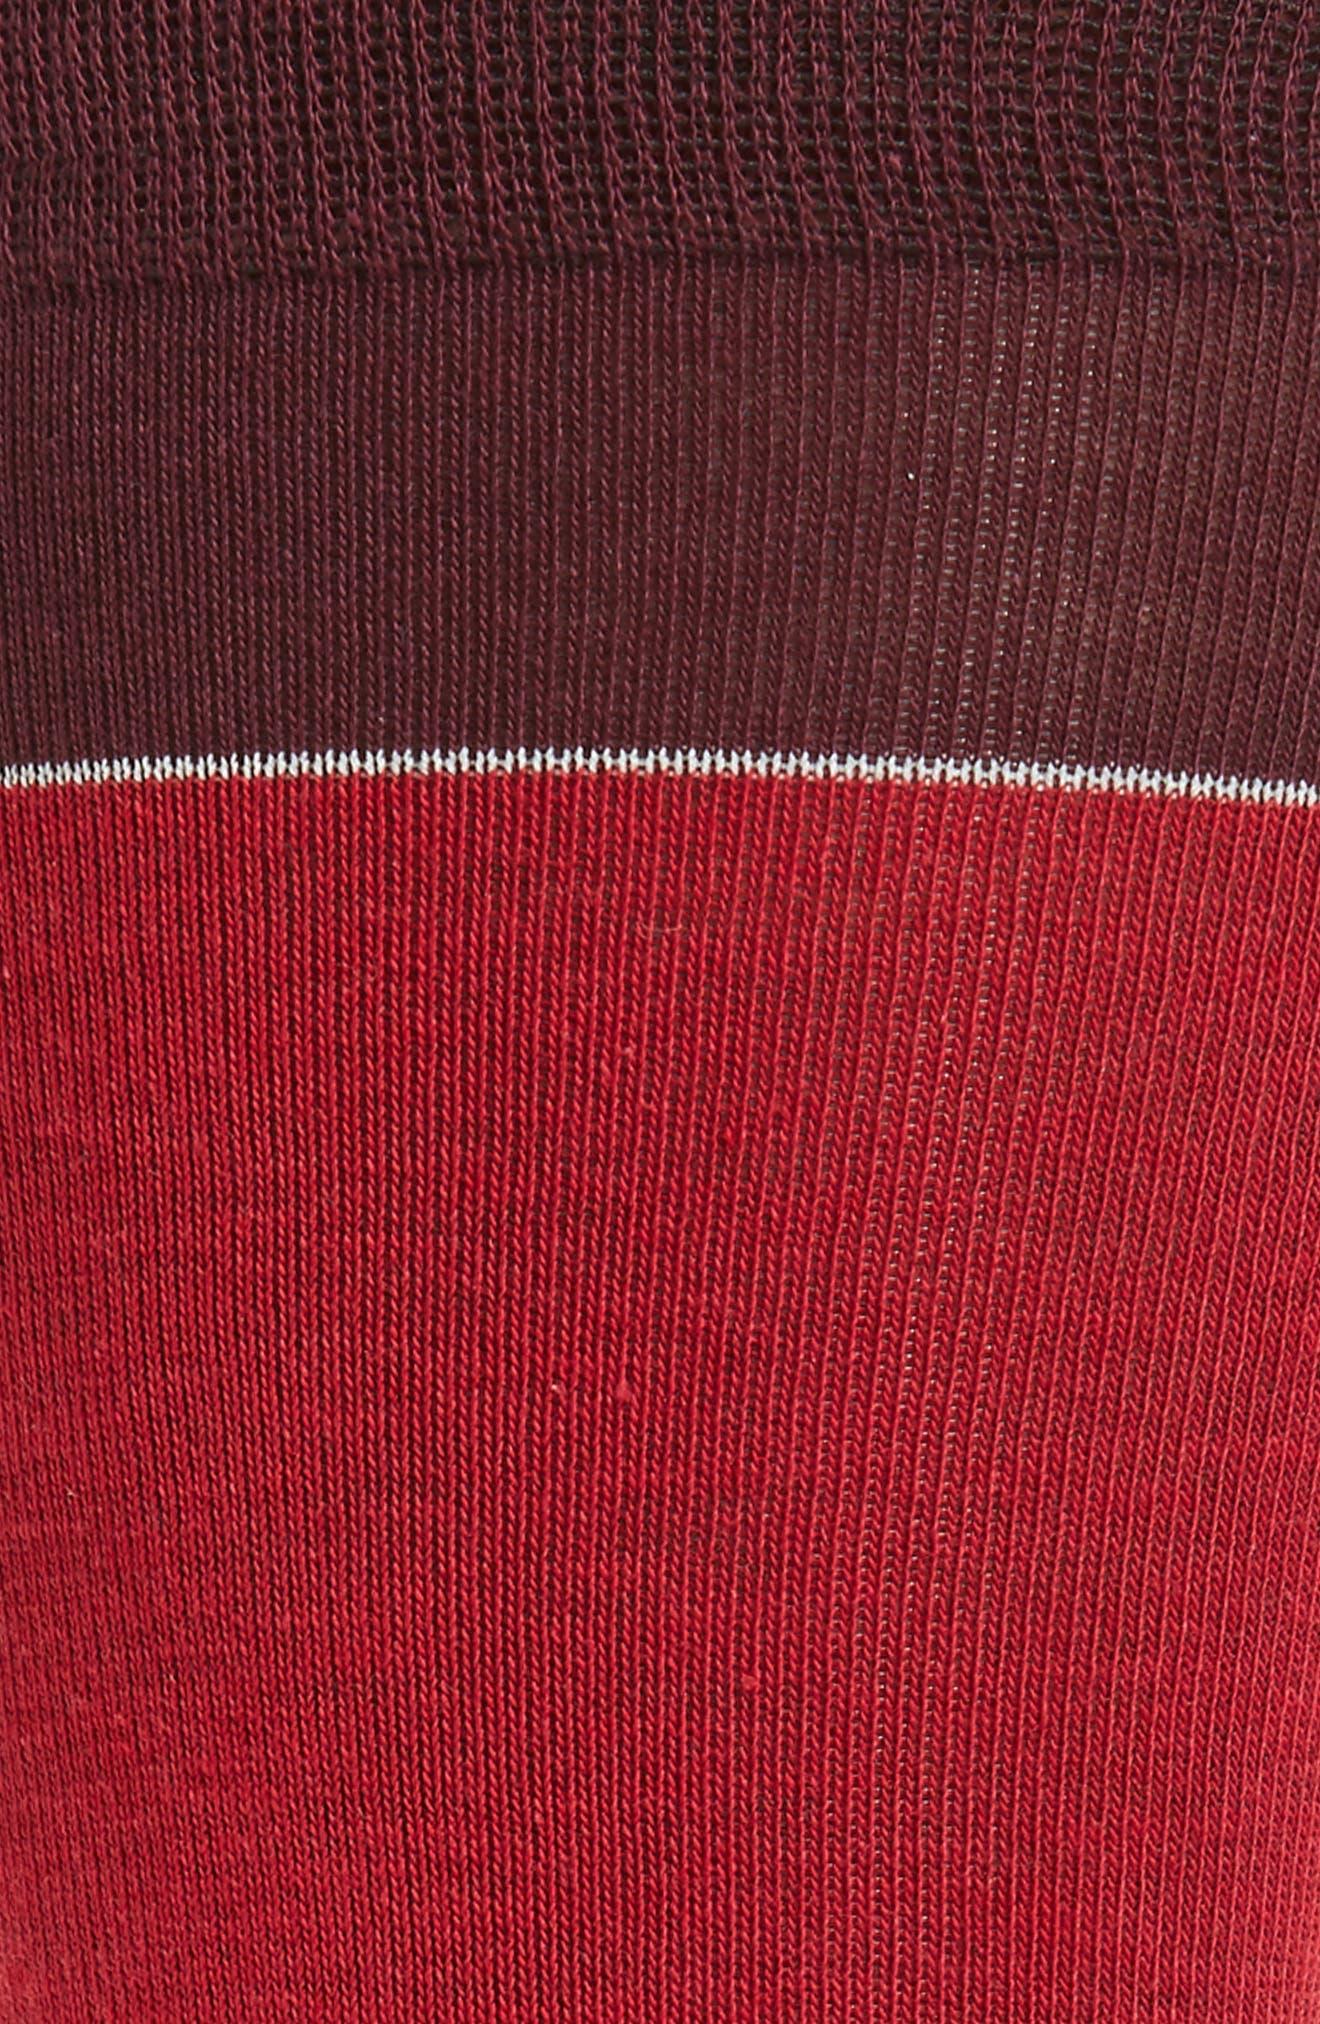 Stripe Socks,                             Alternate thumbnail 2, color,                             060